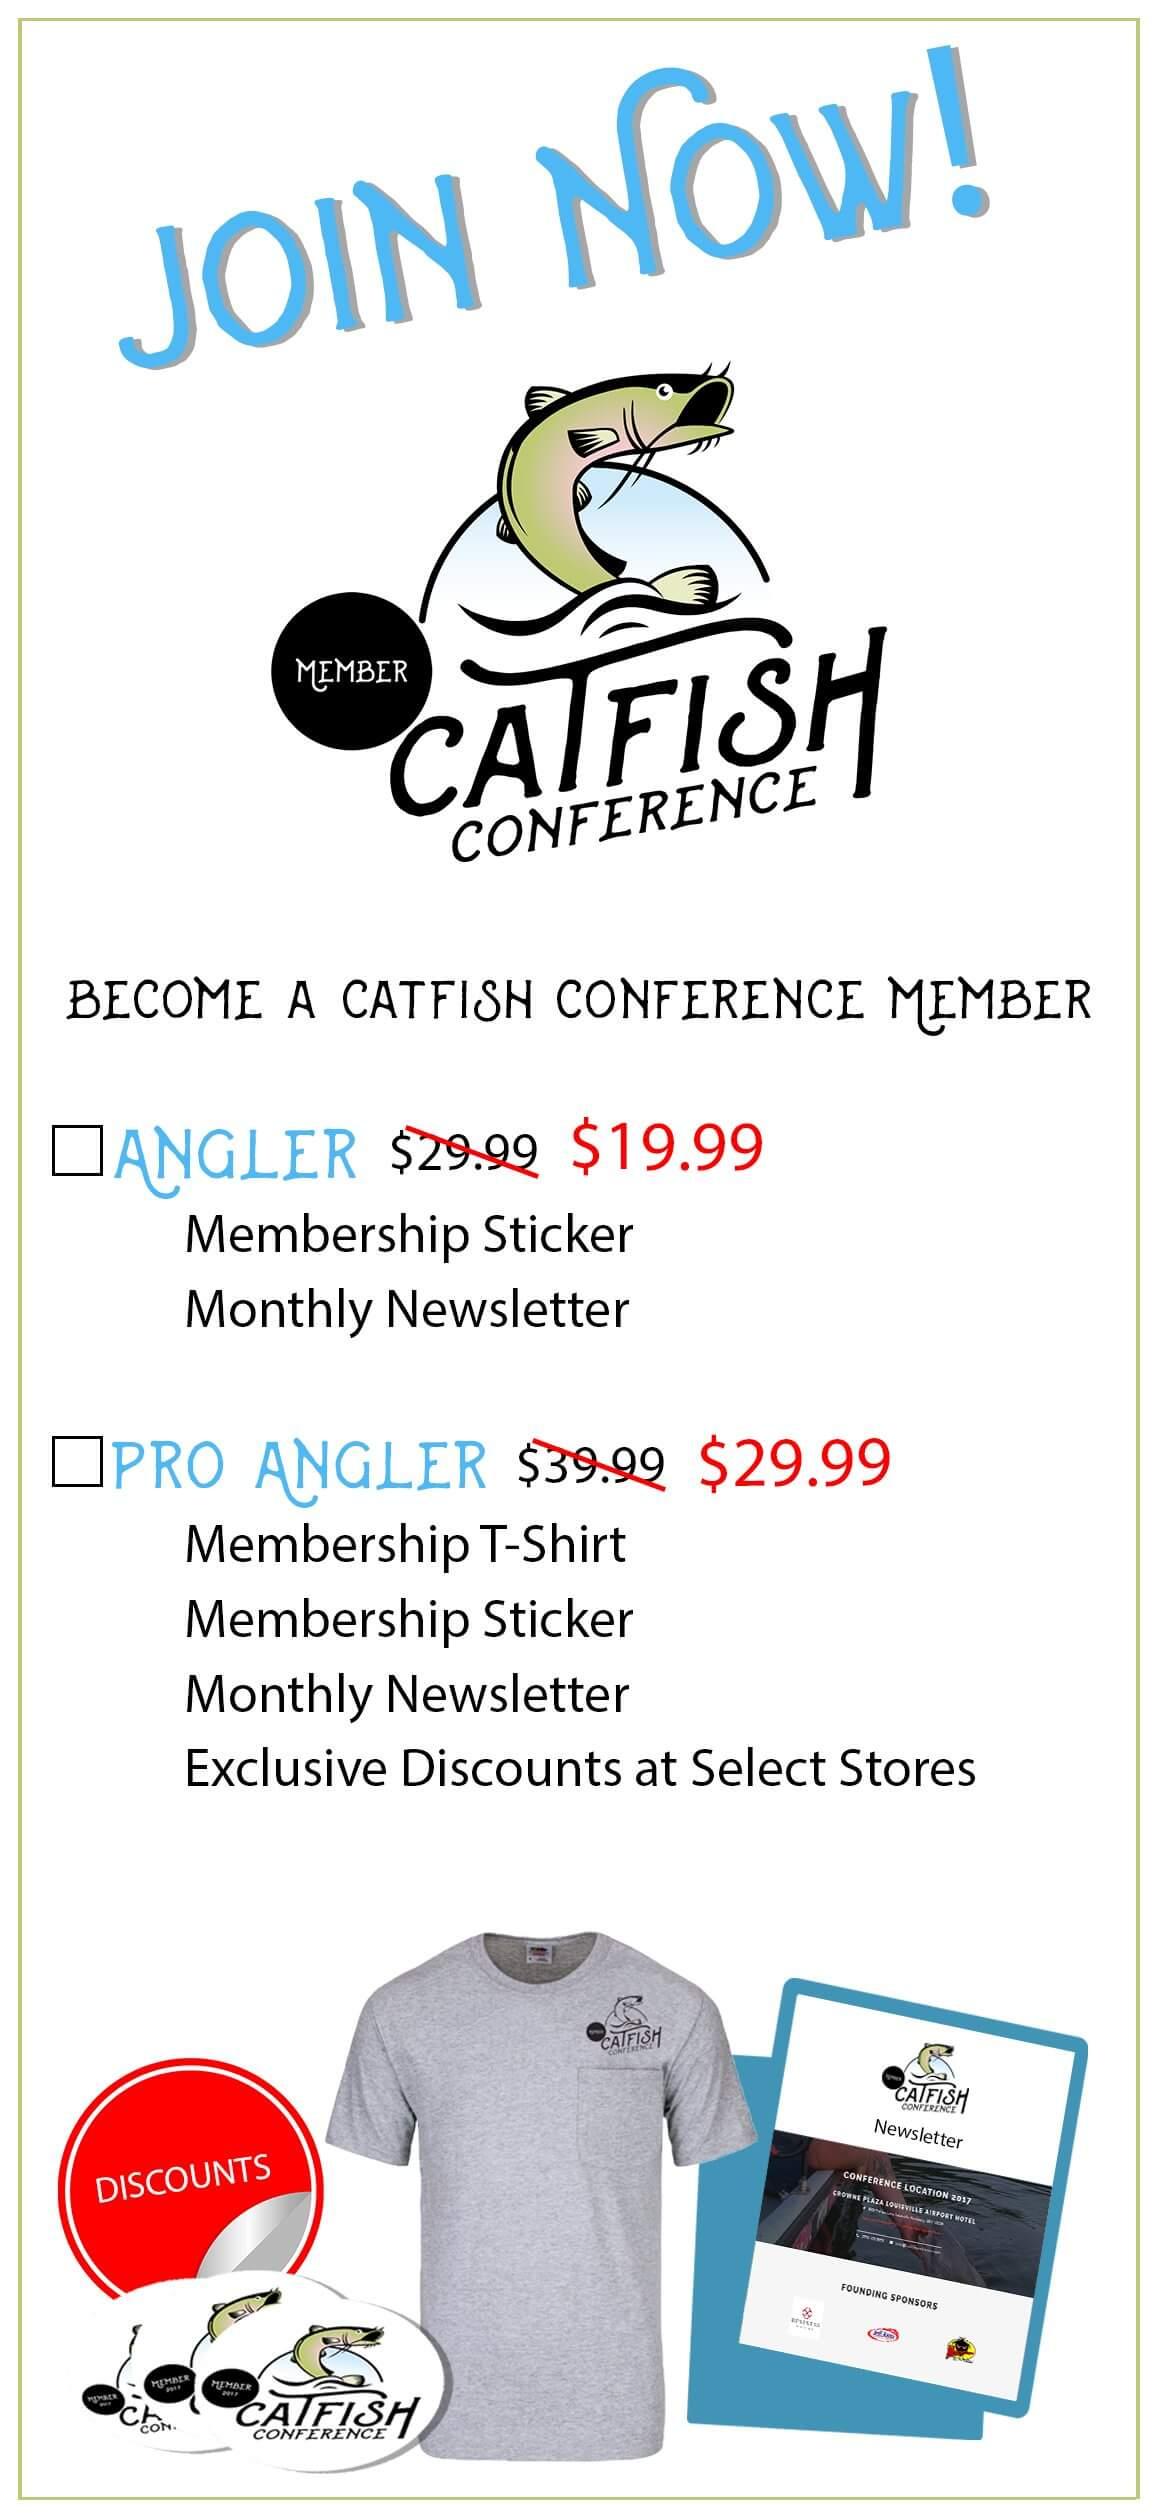 Catfish Conference Pro Angler Membership Catfish Membership Rack Card Front V 4